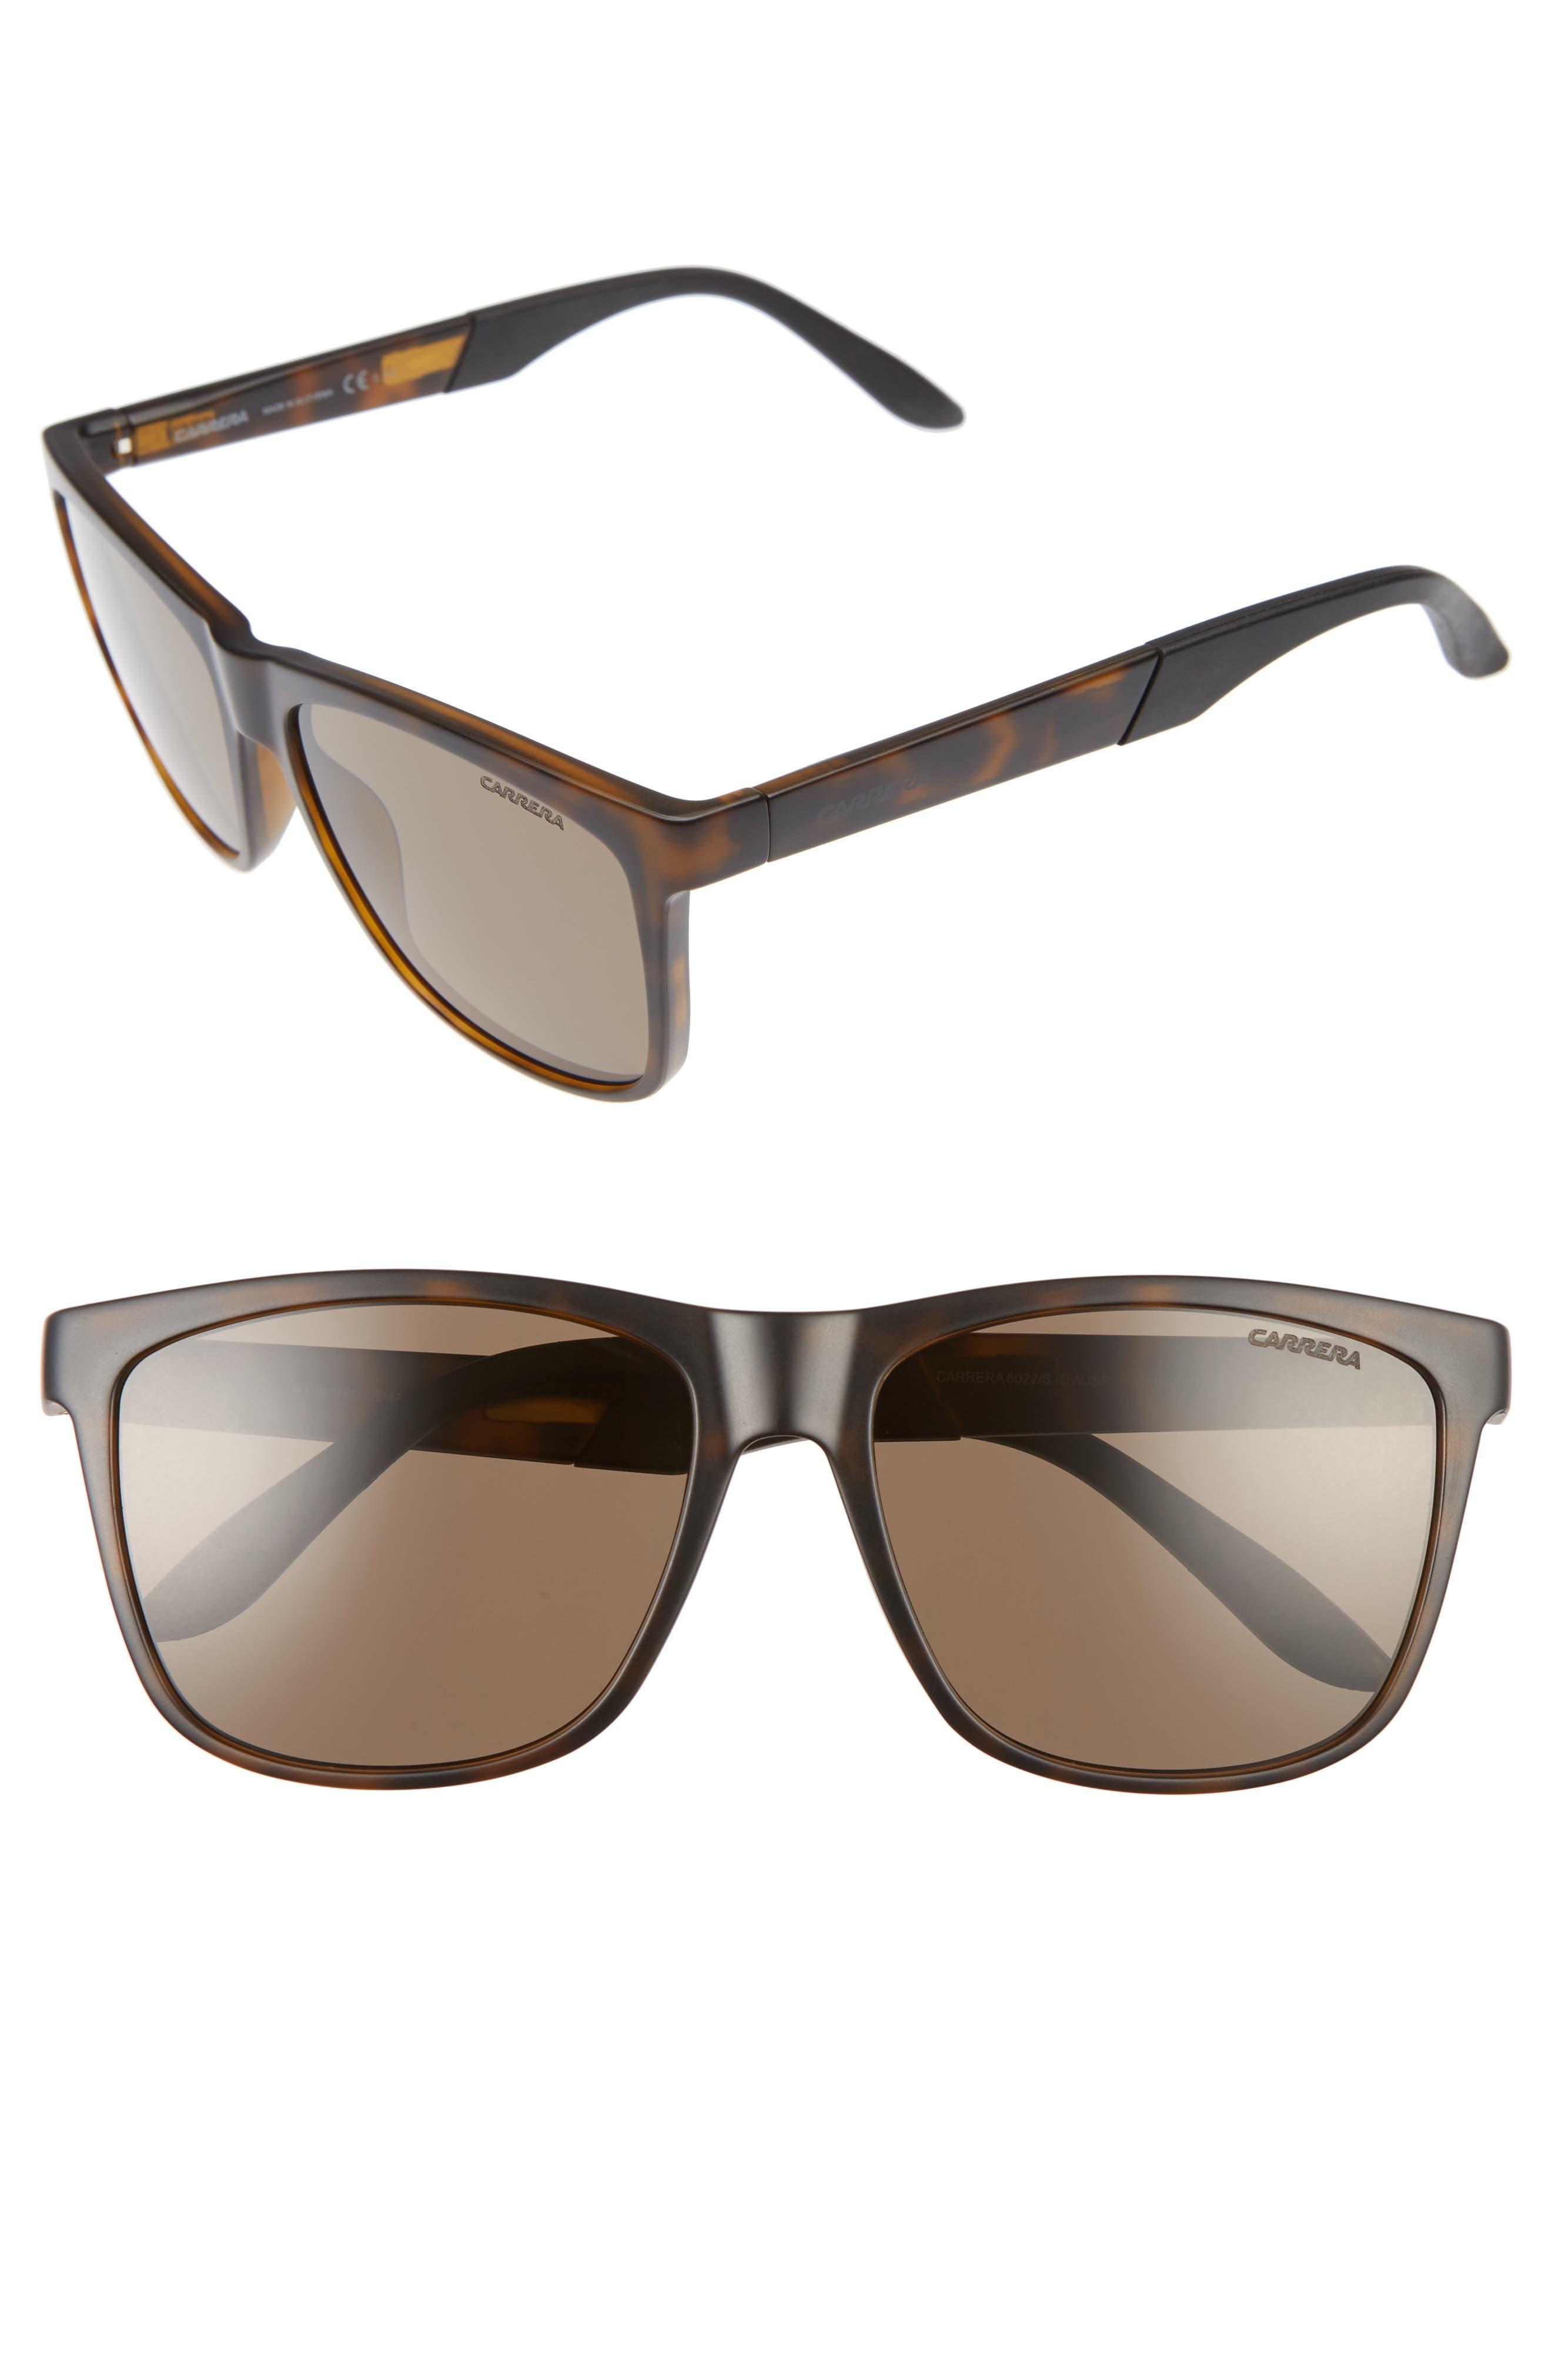 CARRERA EYEWEAR,                             8022/S 56mm Polarized Sunglasses,                             Alternate thumbnail 2, color,                             HAVANA